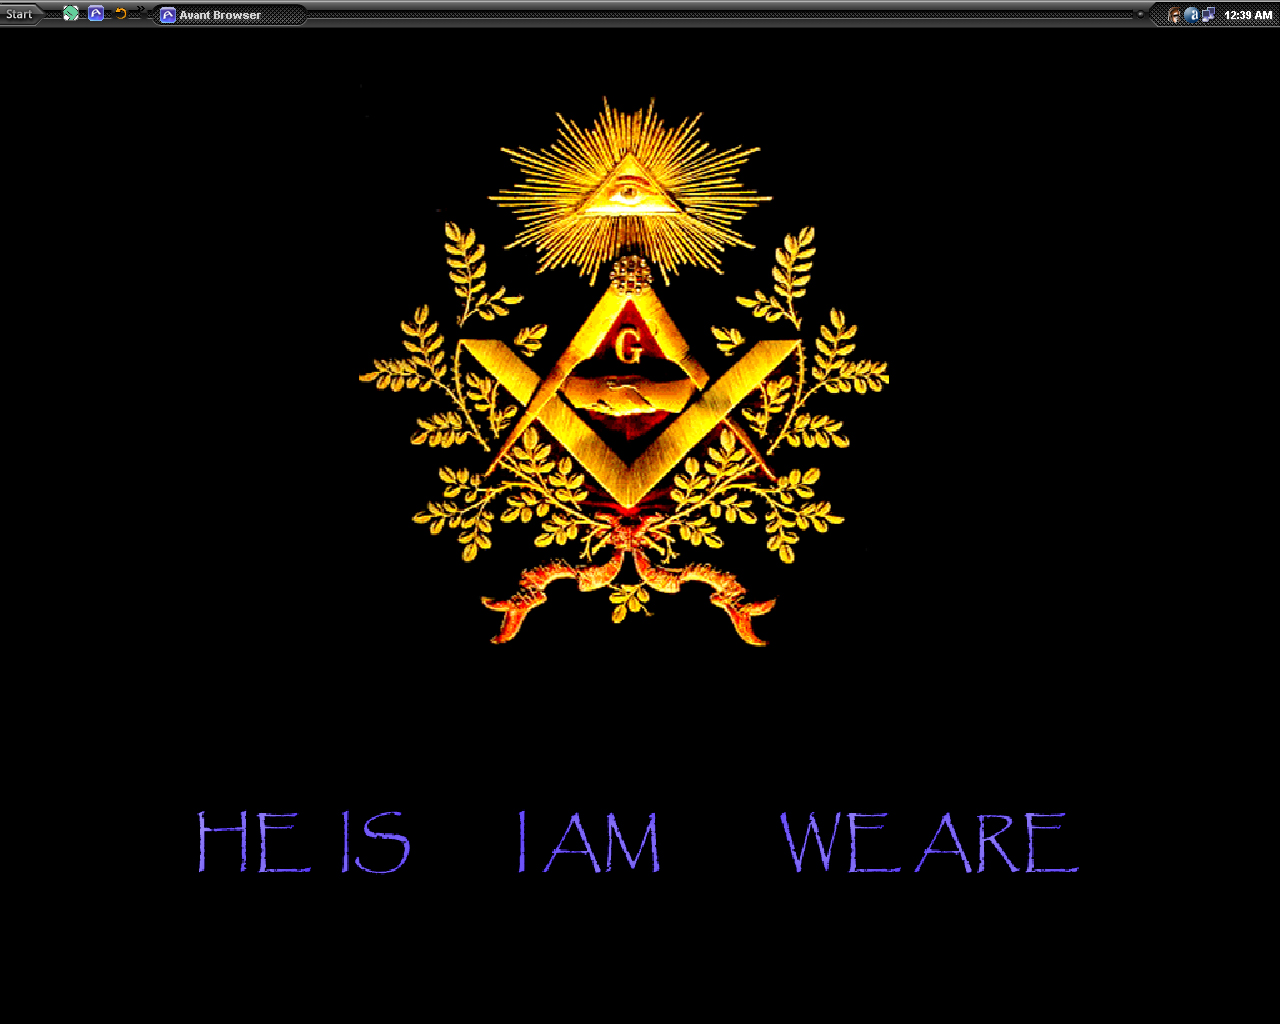 Freemason Symbol Wallpaper Freemason xp by davader 1280x1024